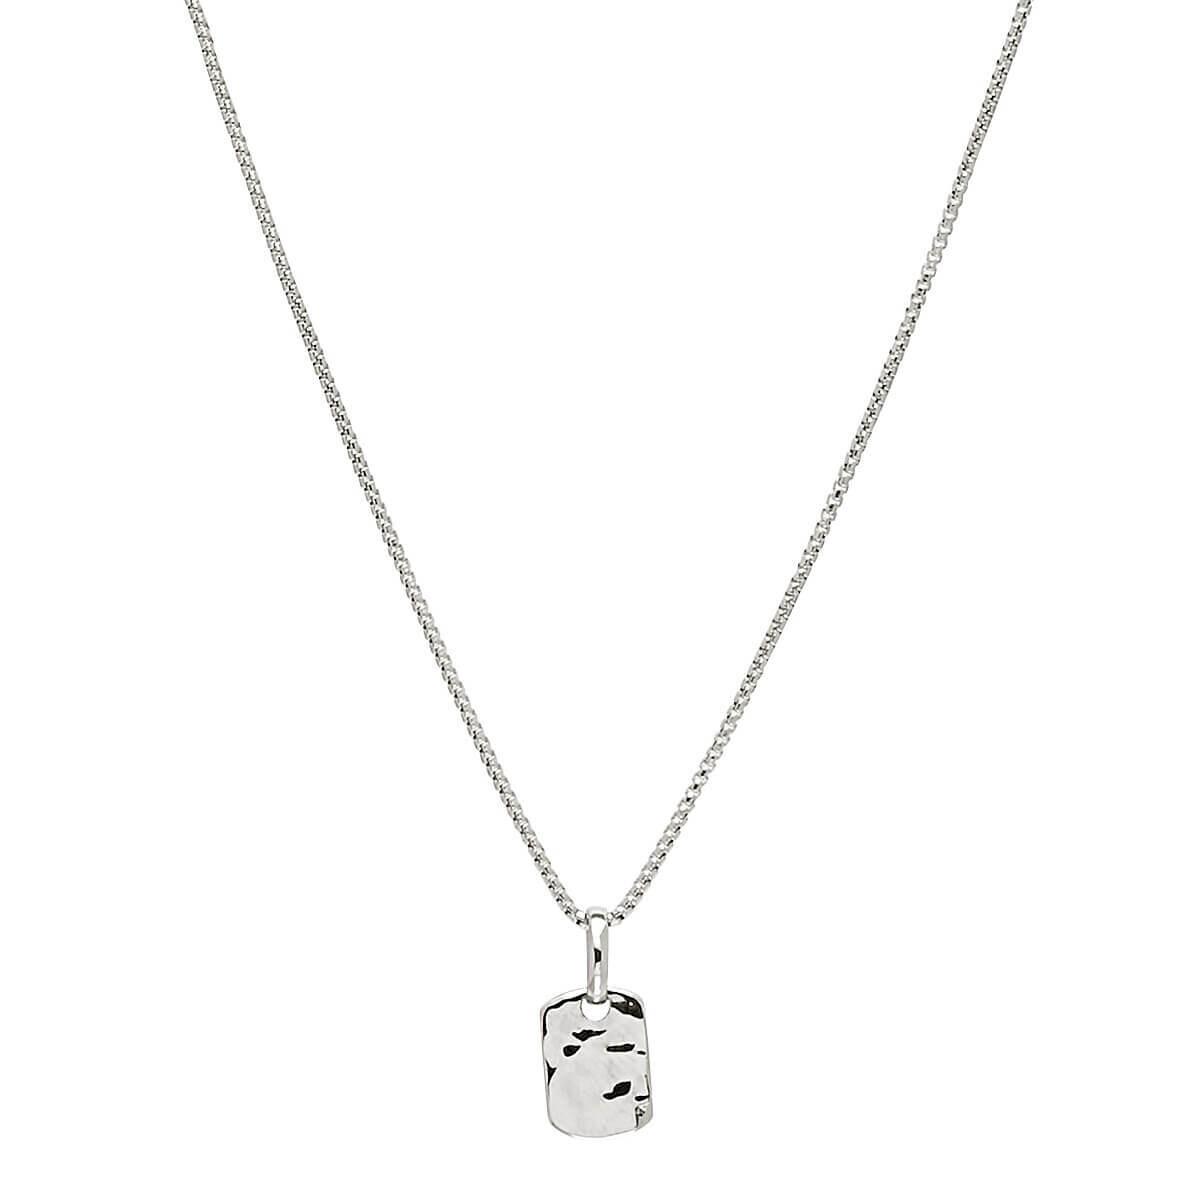 Najo - Tigger Silver Necklace